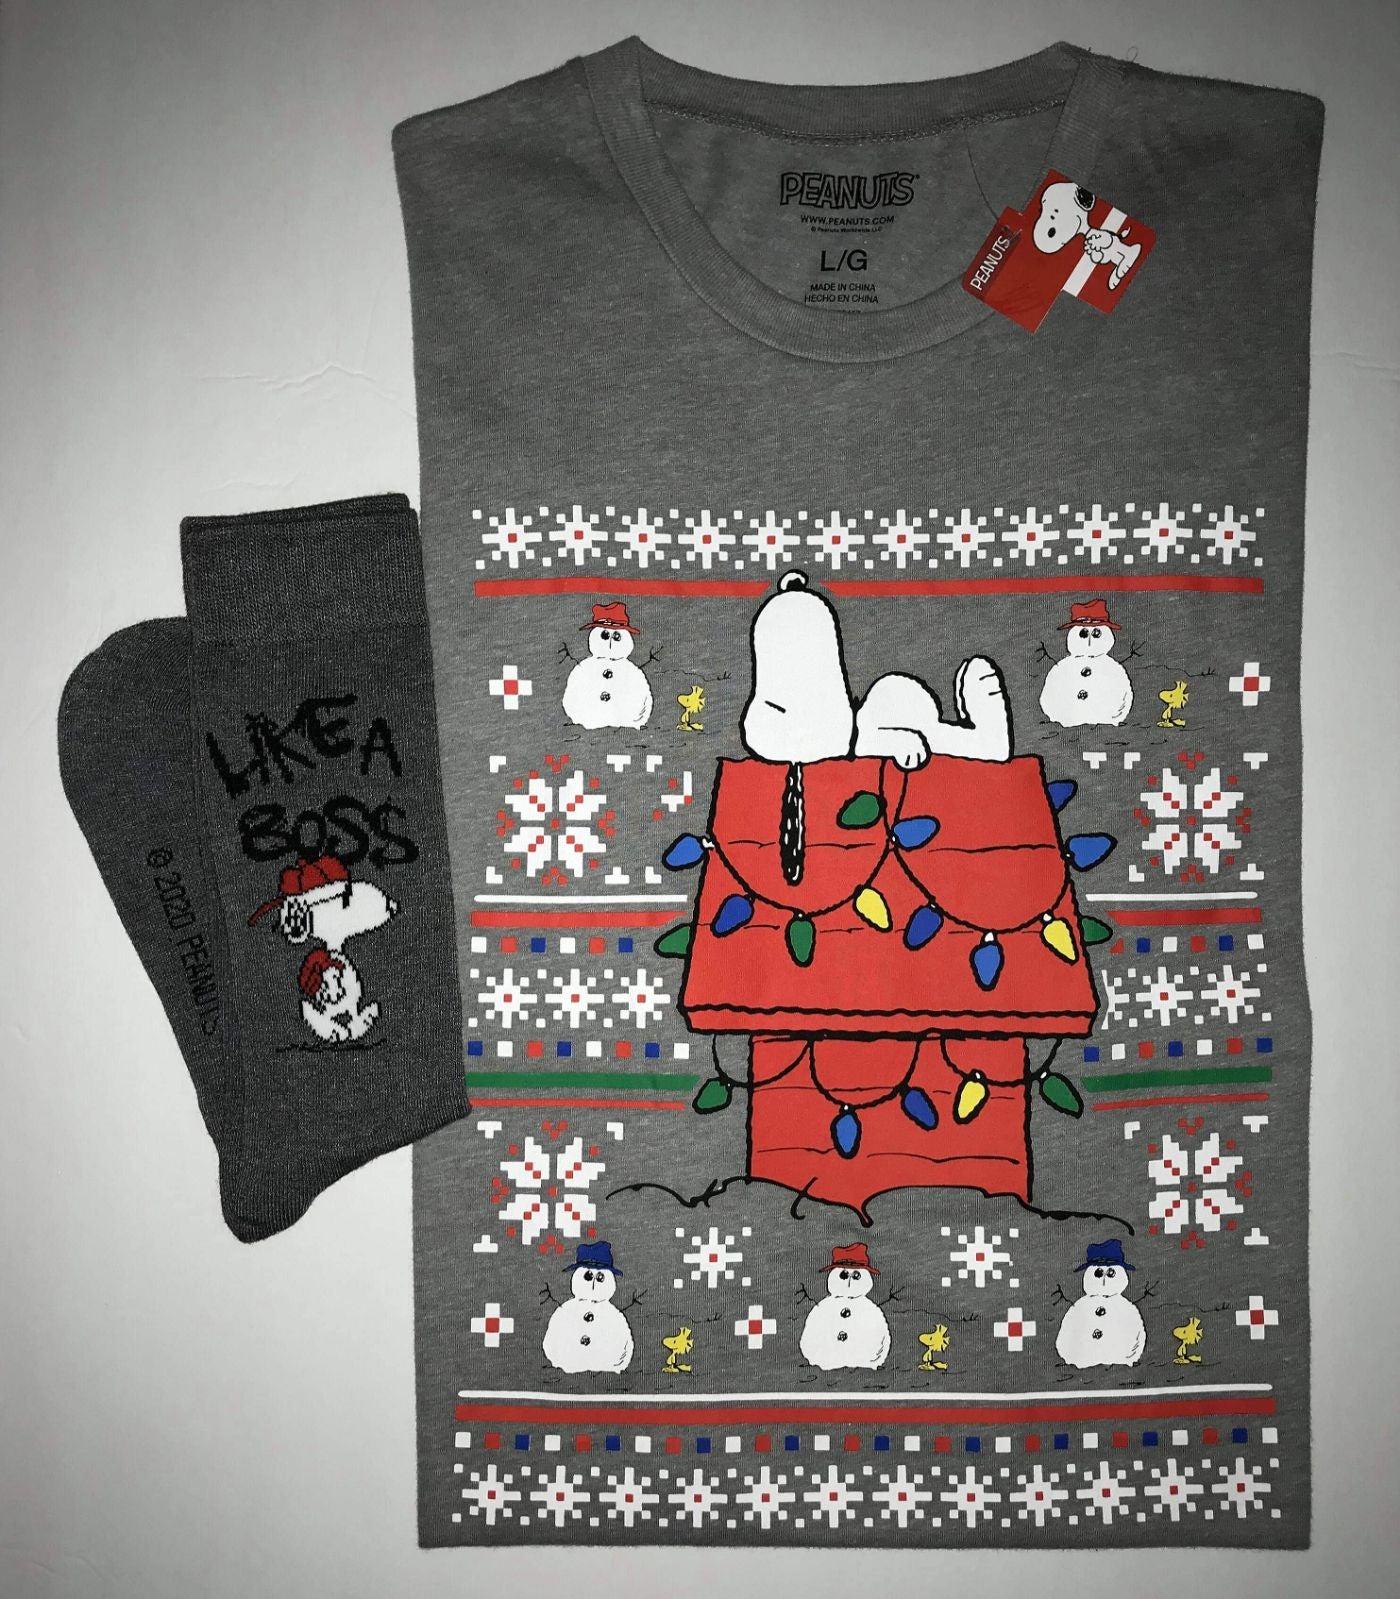 PEANUTS CHRISTMAS SNOOPY T-SHIRT & SOCKS